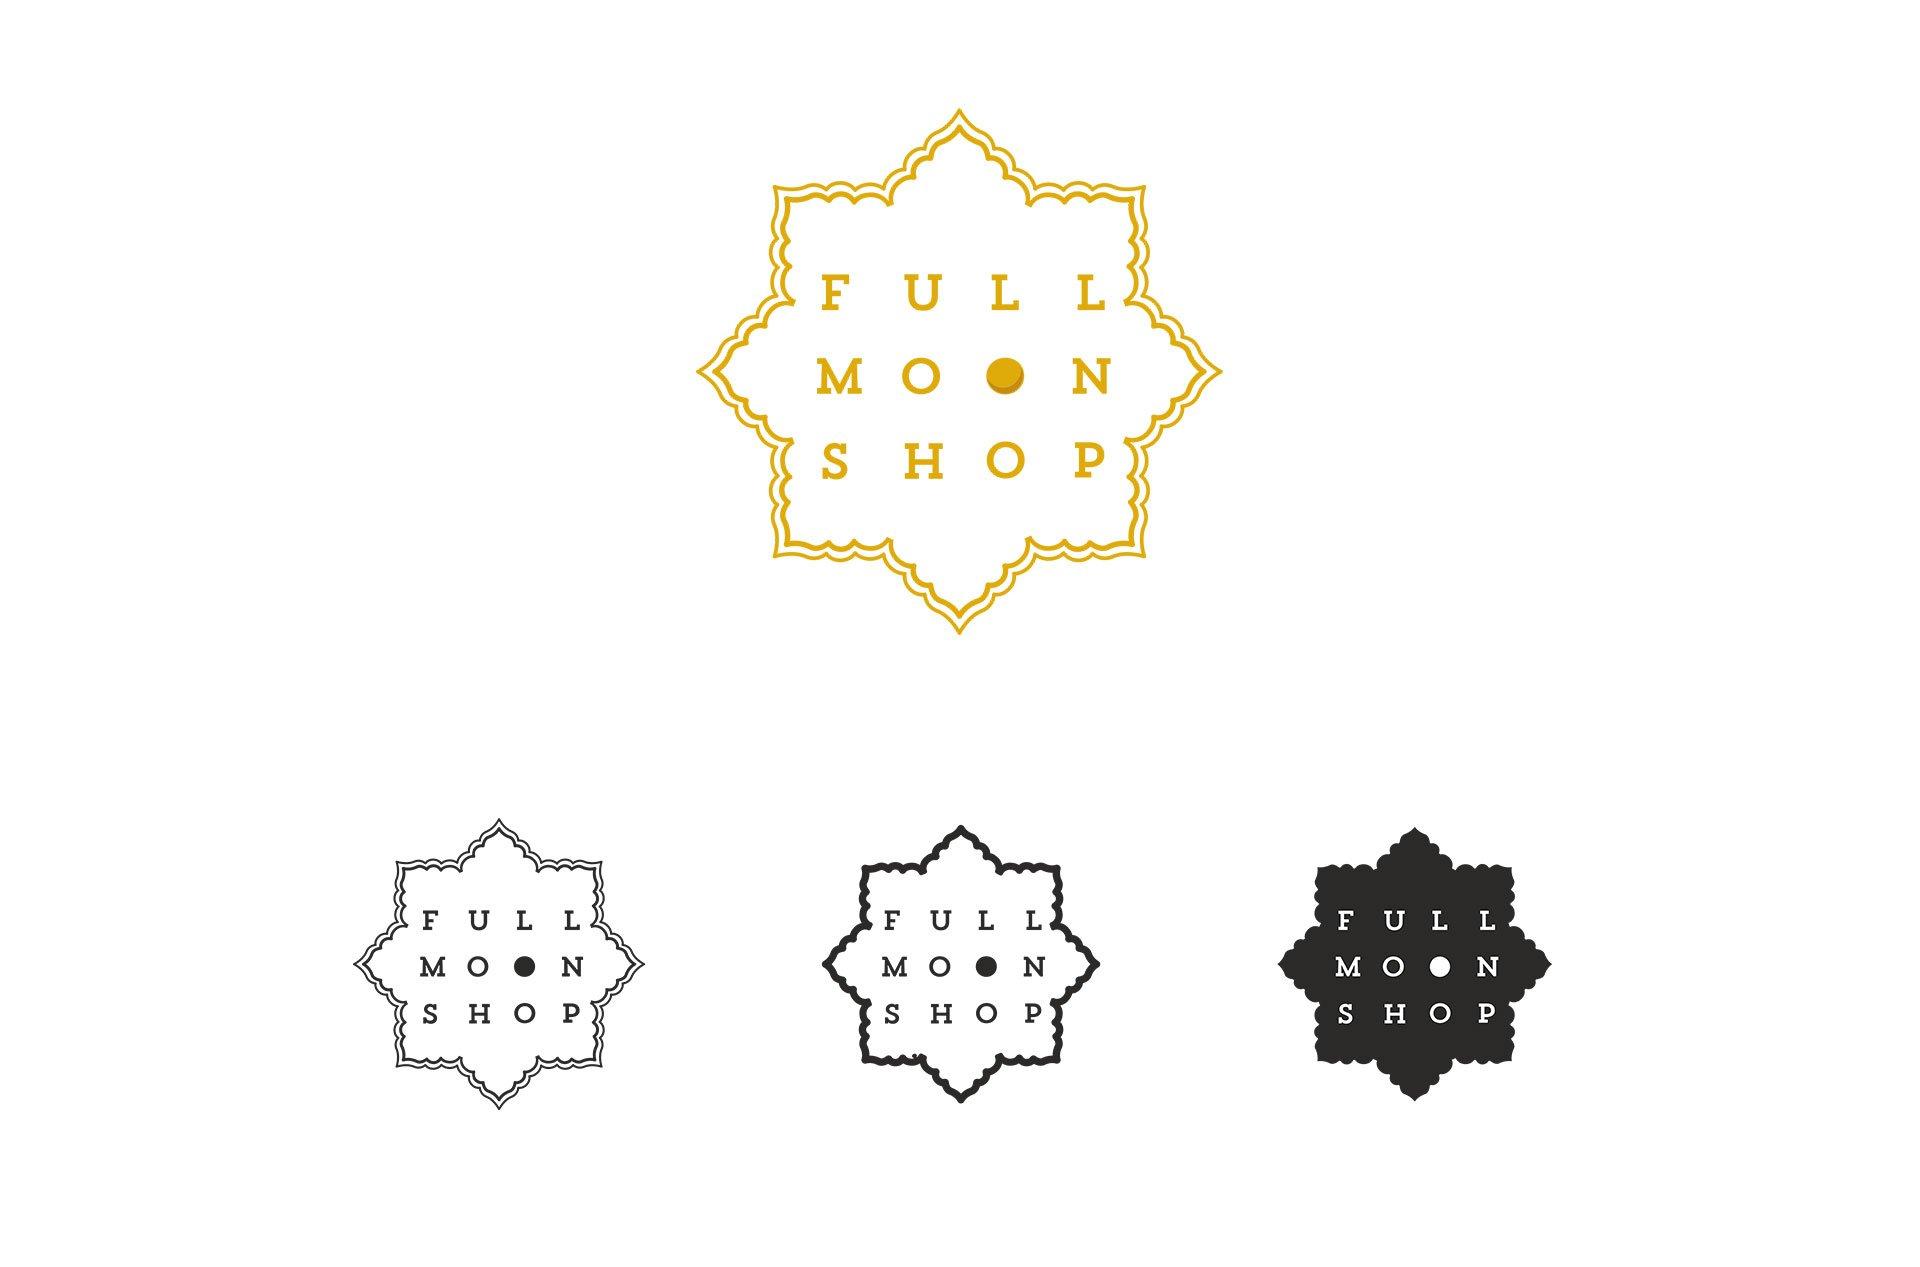 FullMoonShop-01